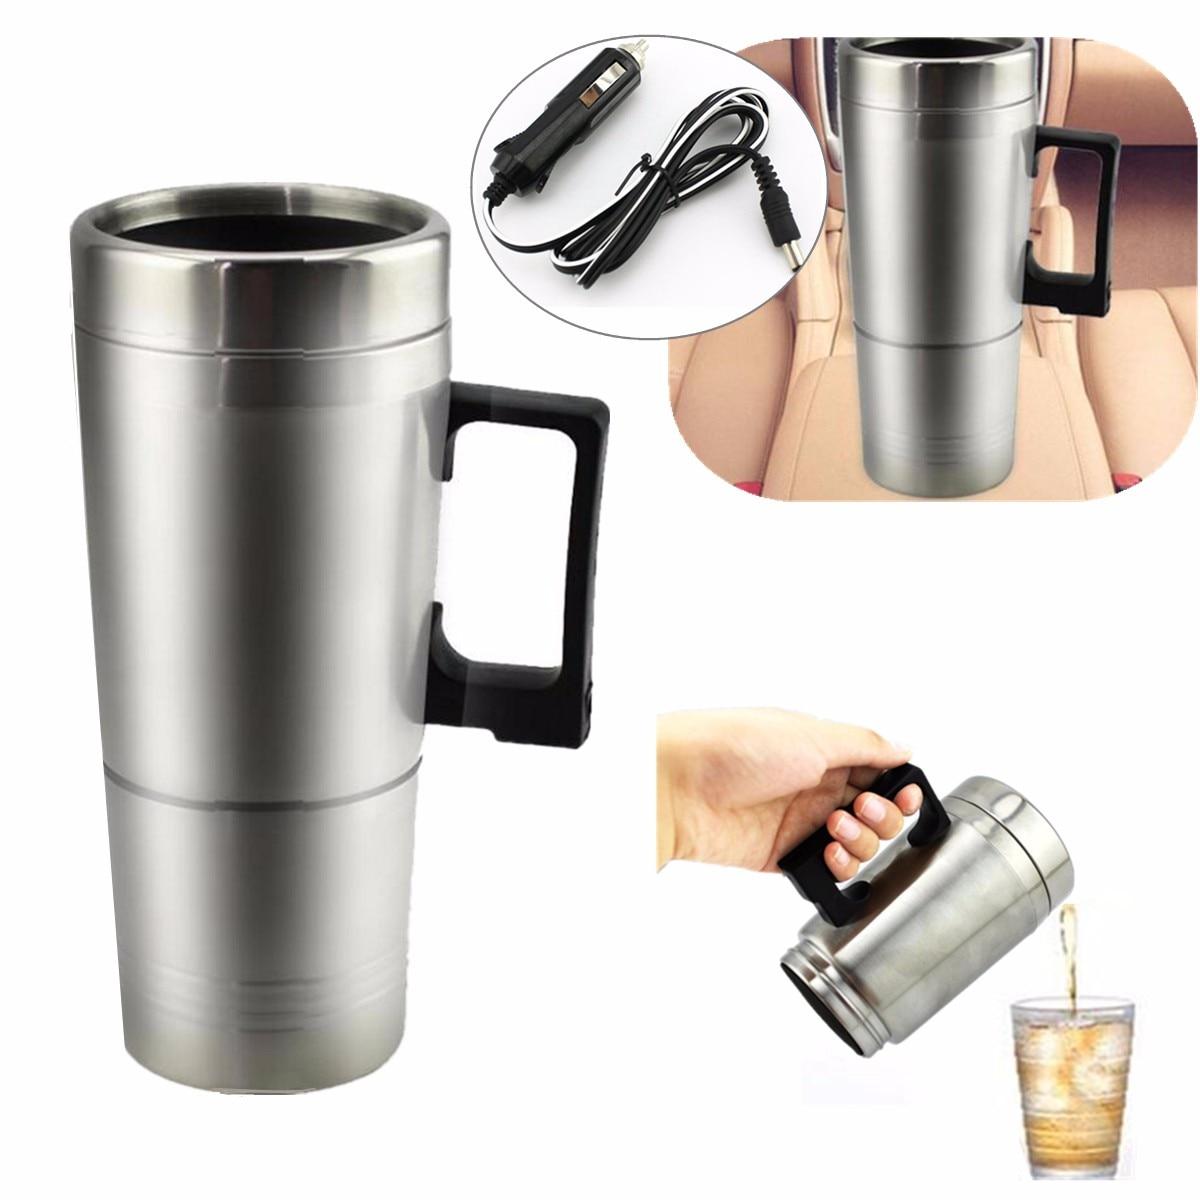 Car Water Soup Tea Coffee Baby Bottle Heater Boiler Car Heater Cup Tea Pot Portable New